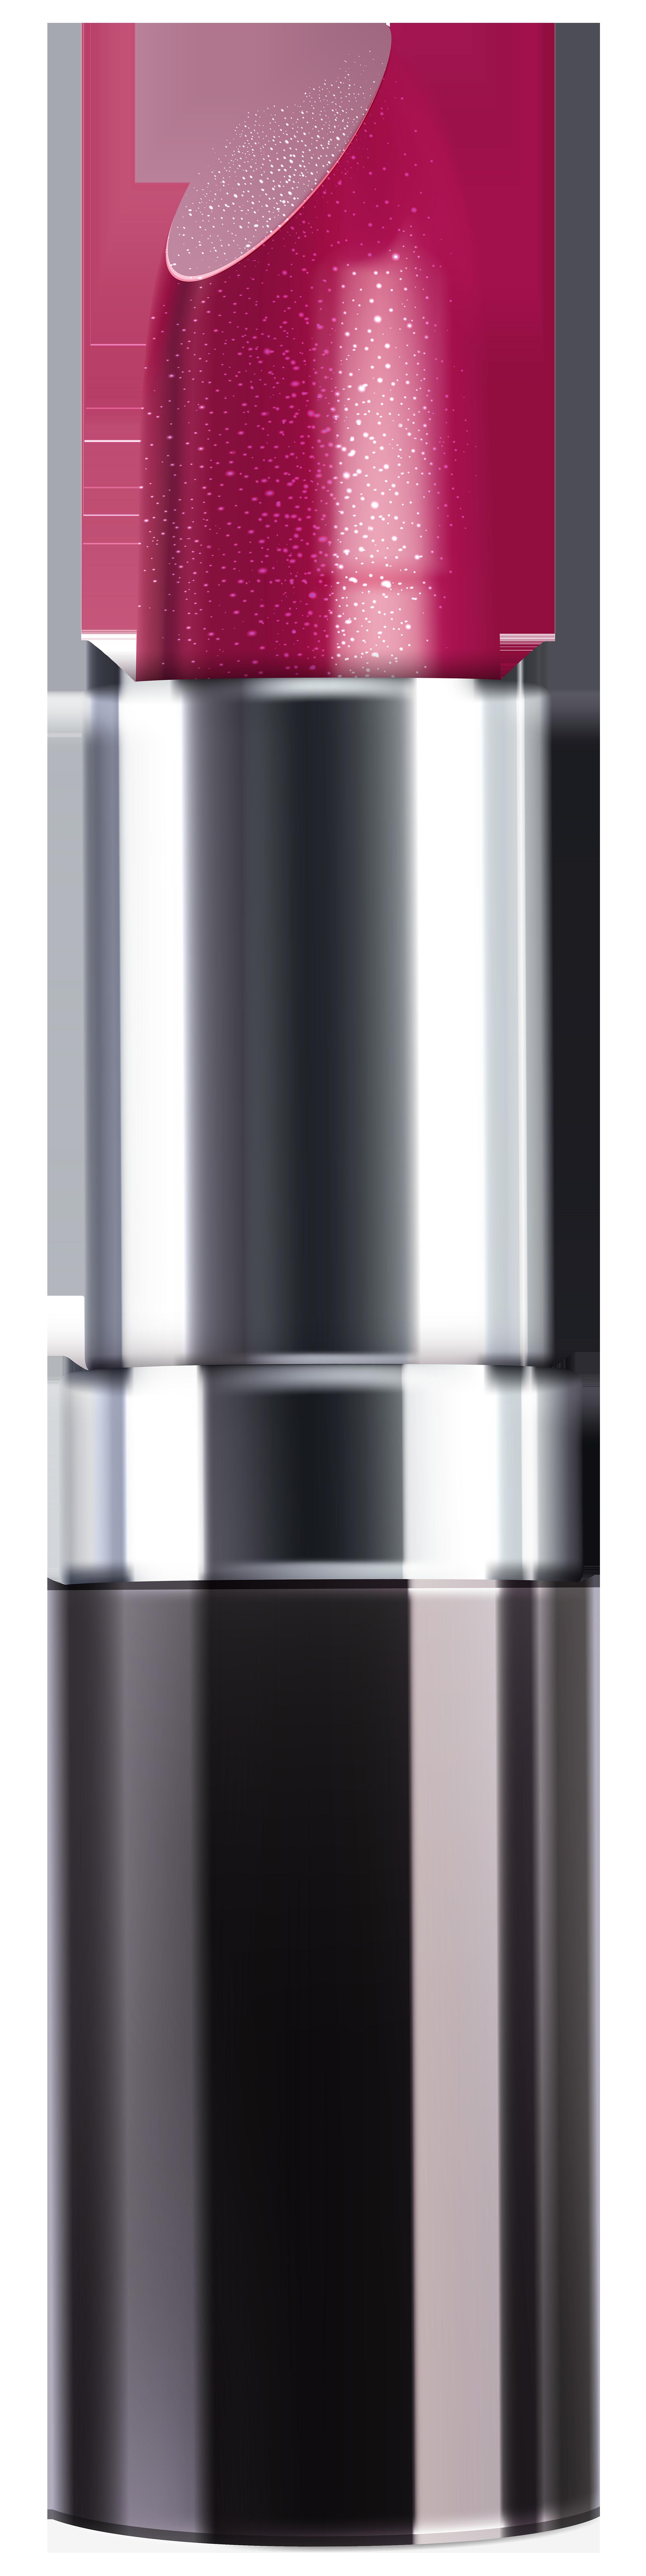 Lipstick png transparent image. Lip clipart sparkly lip